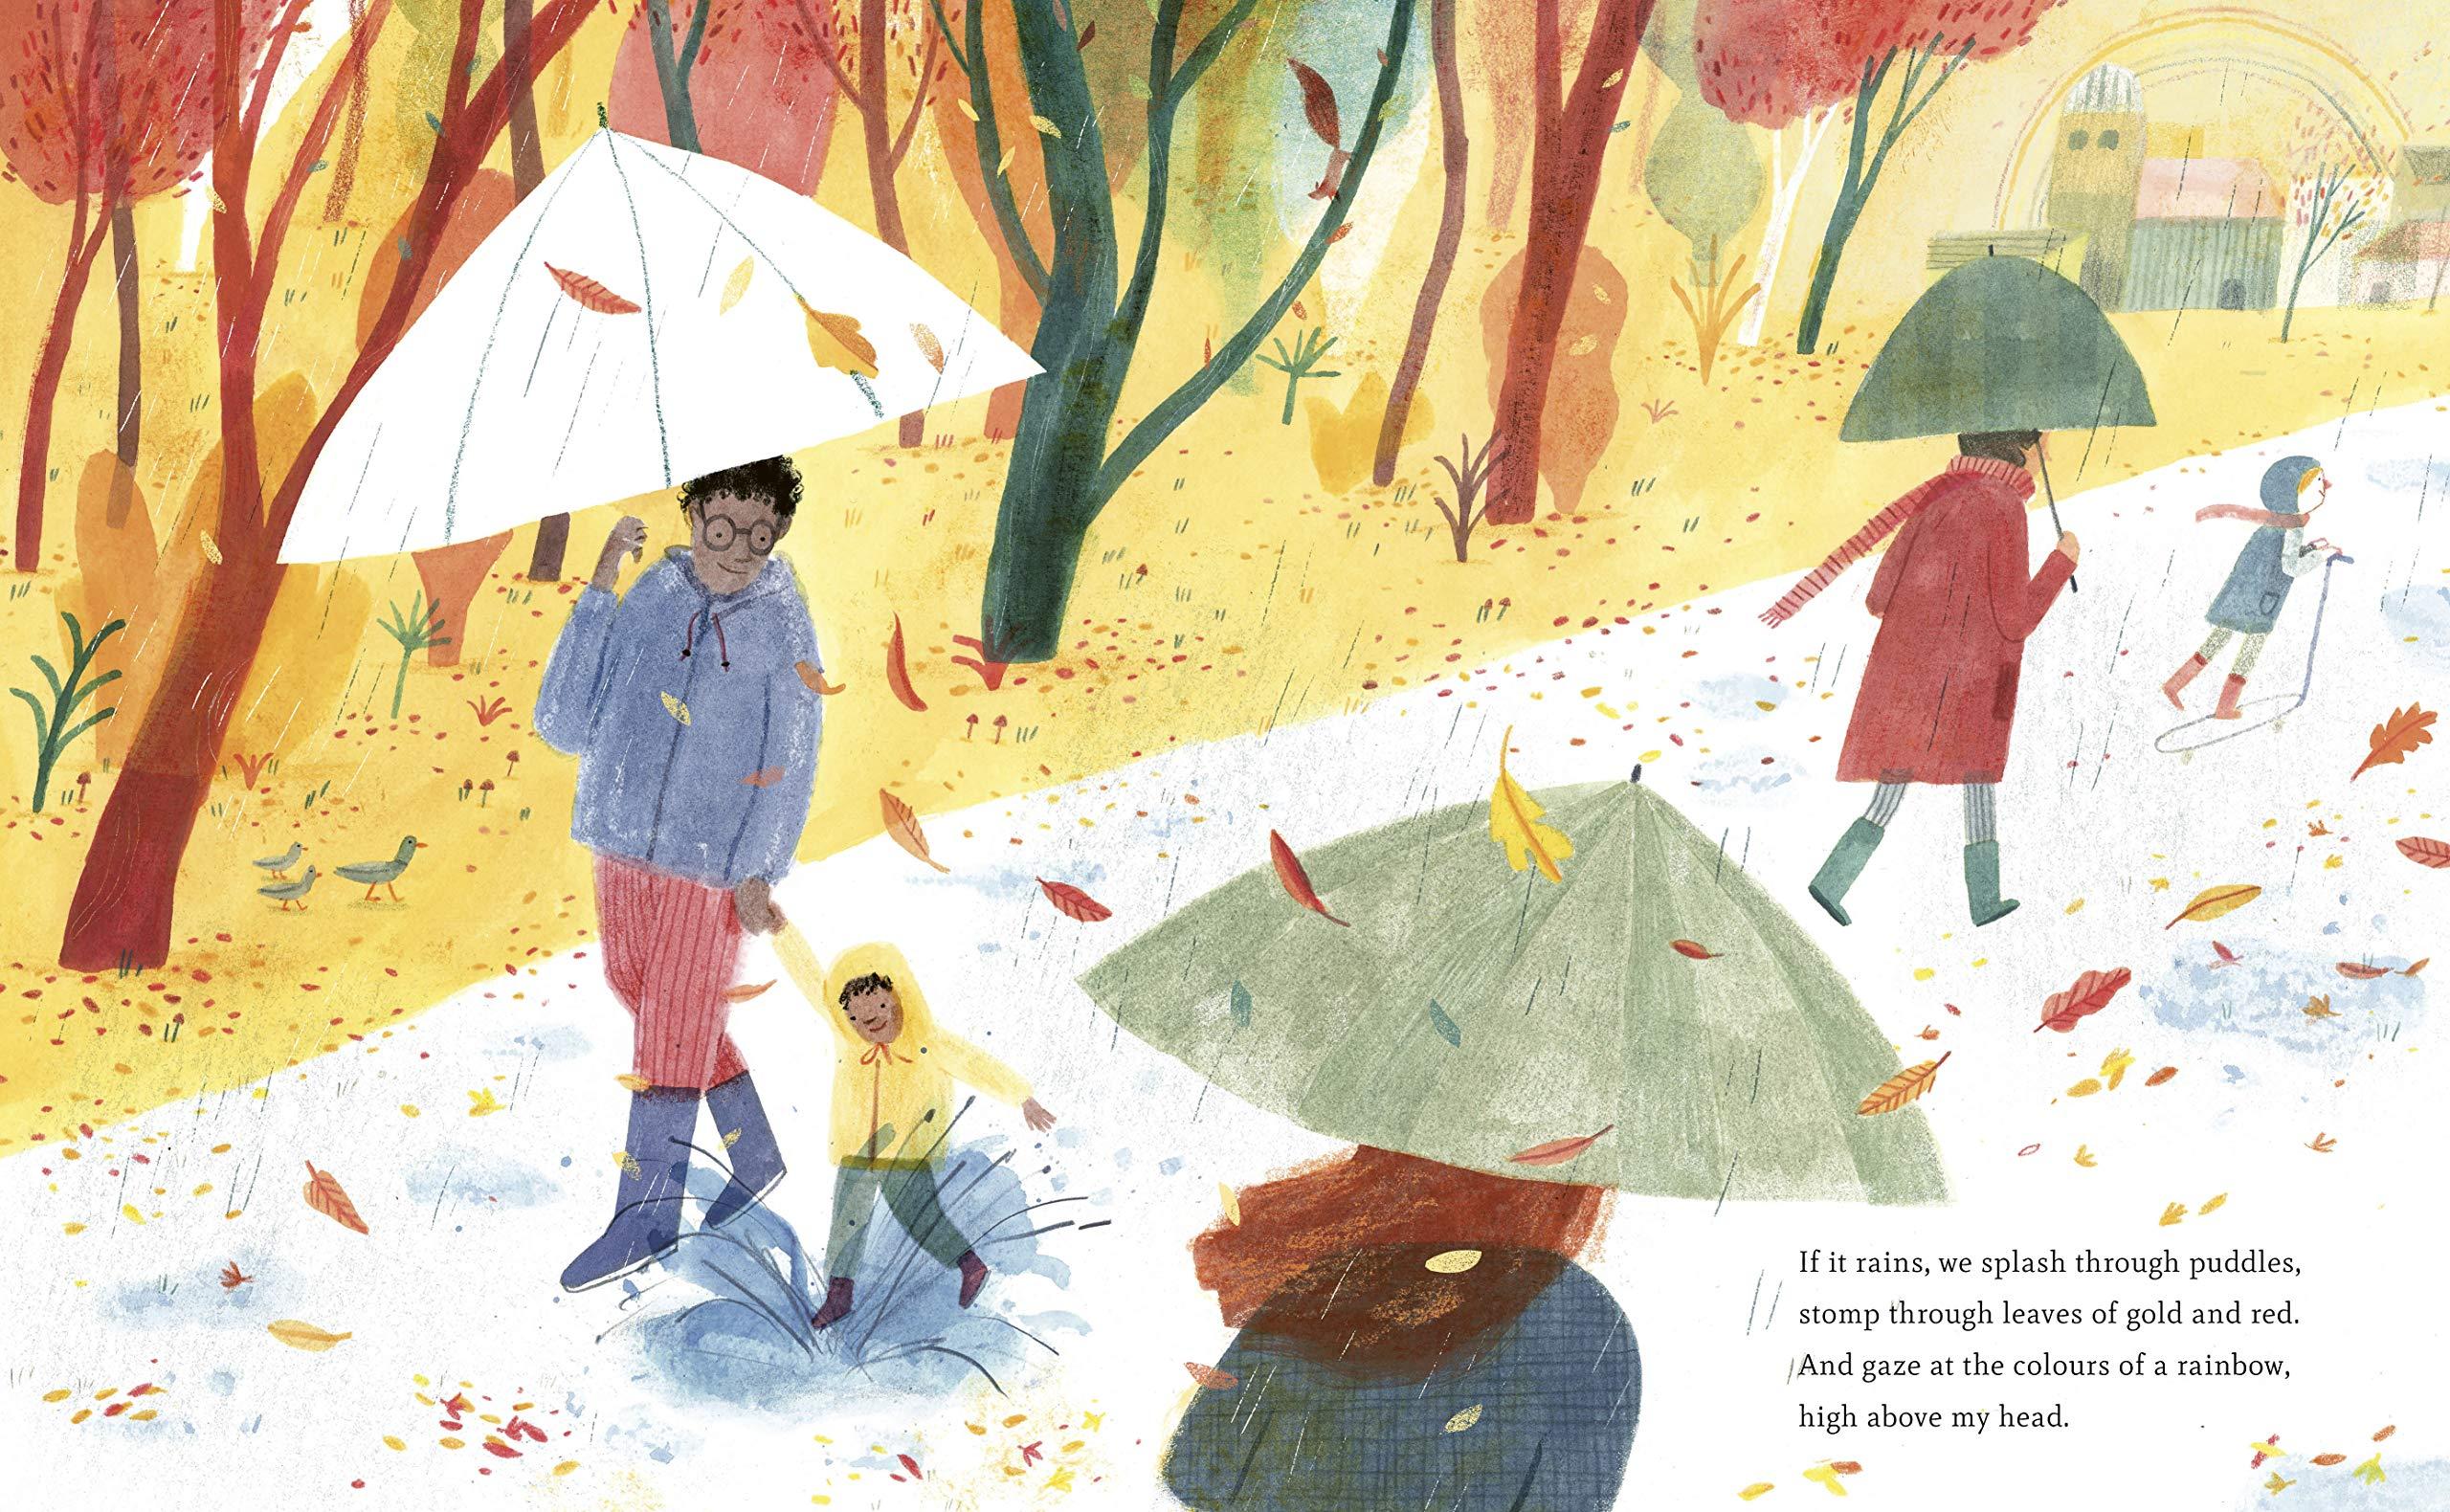 celebrate-picture-books-picture-book-review-my-day-rain